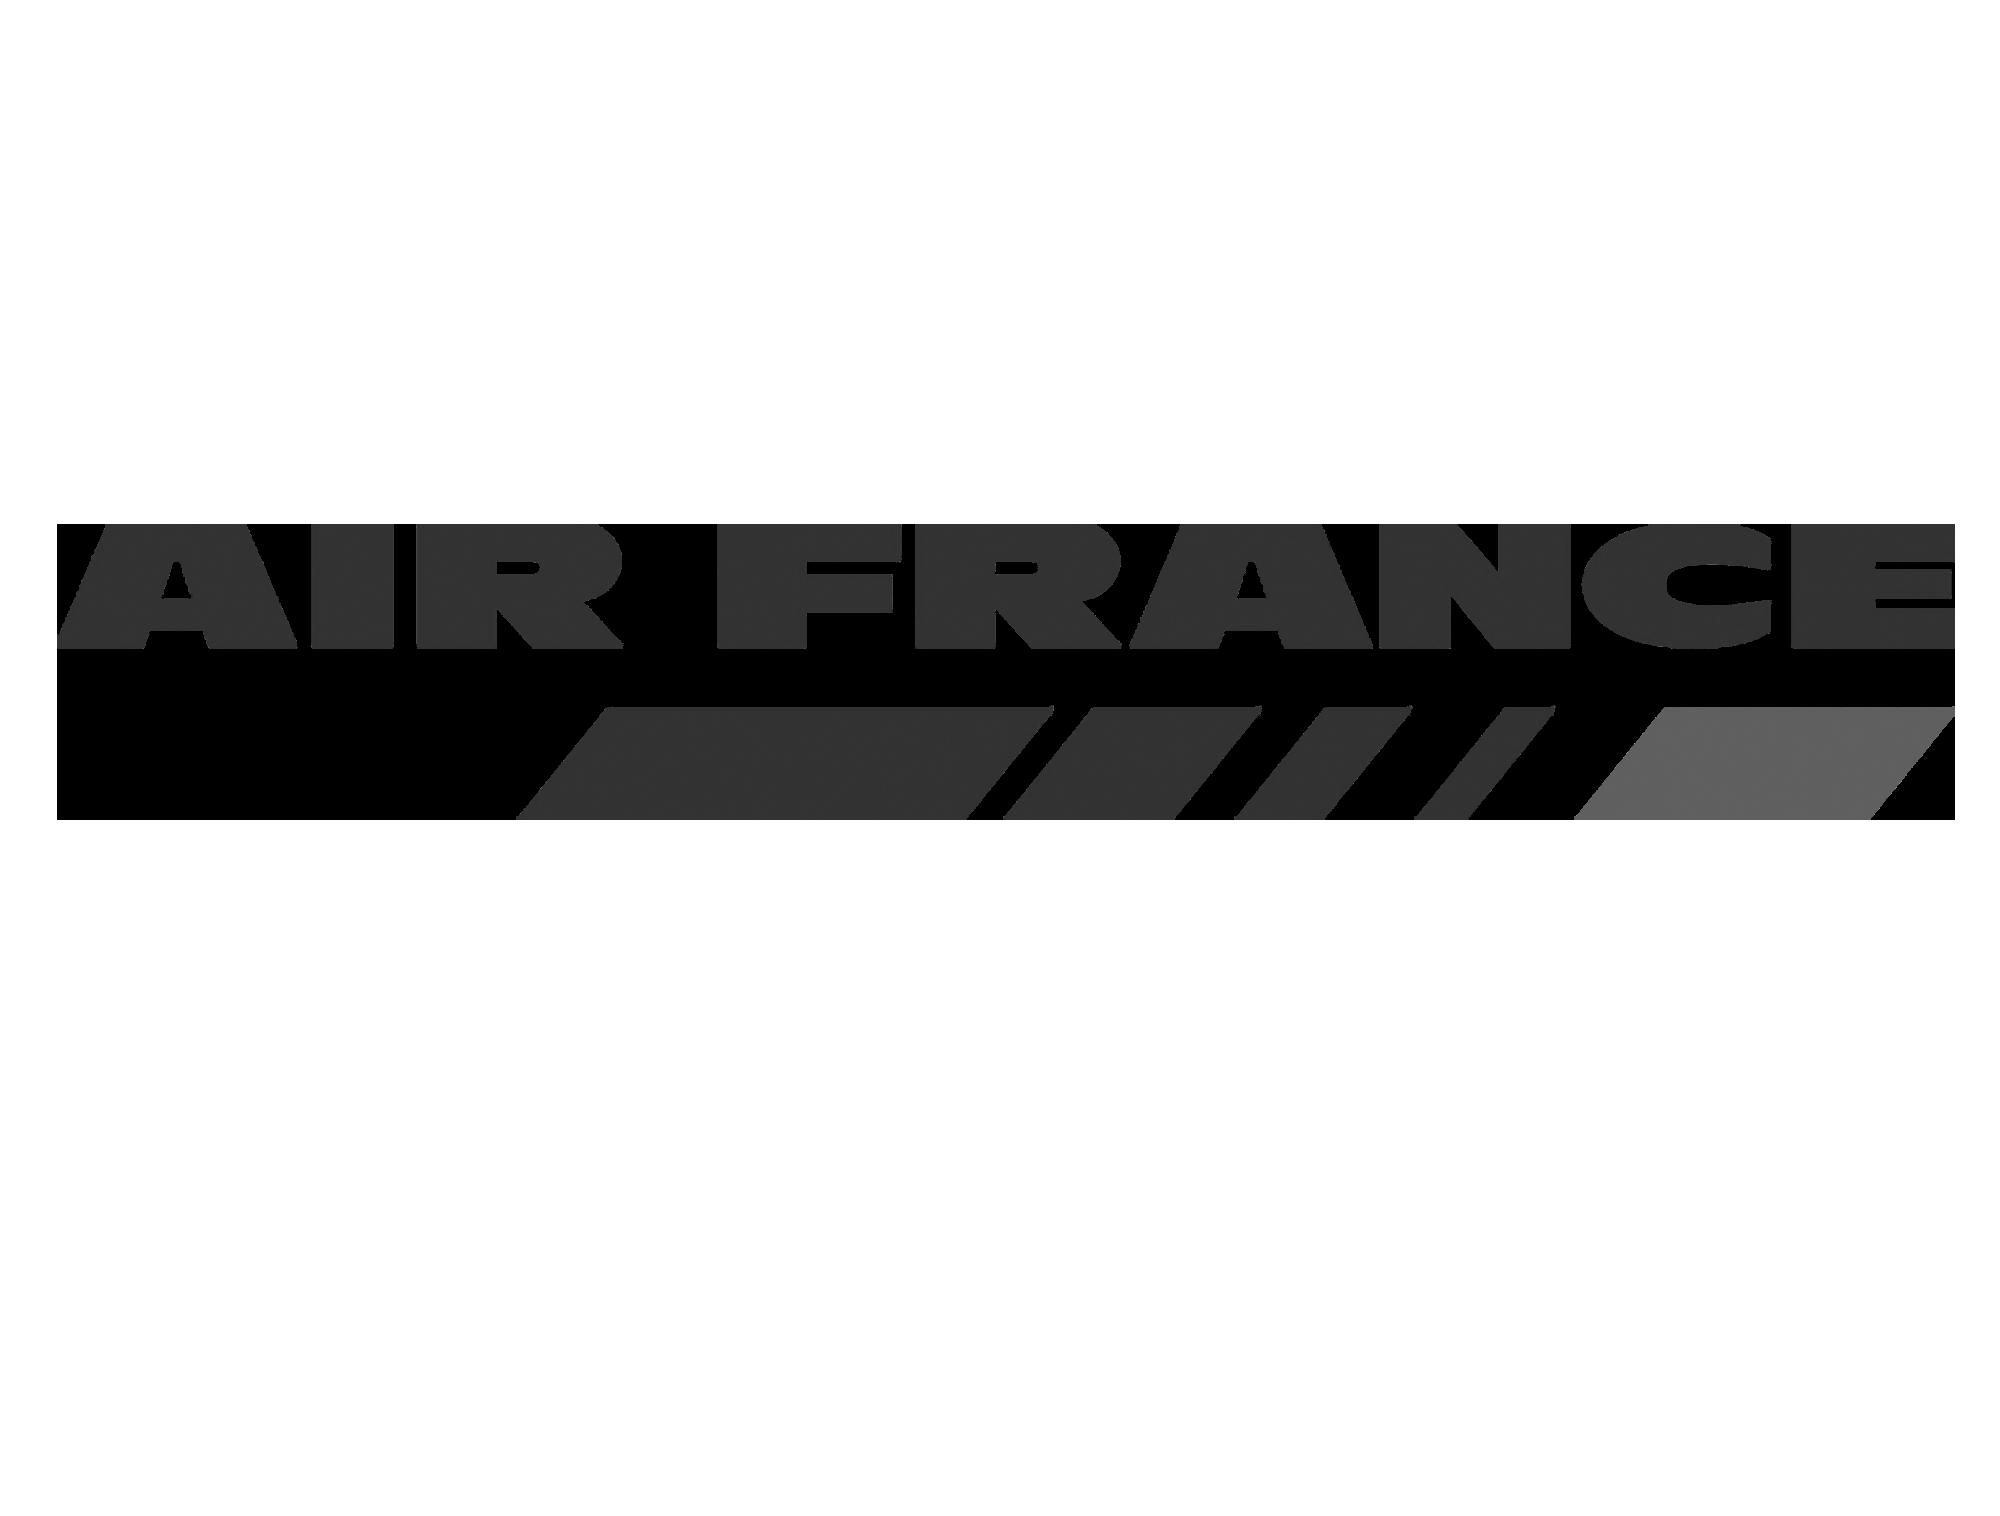 AirFranceLogo.png